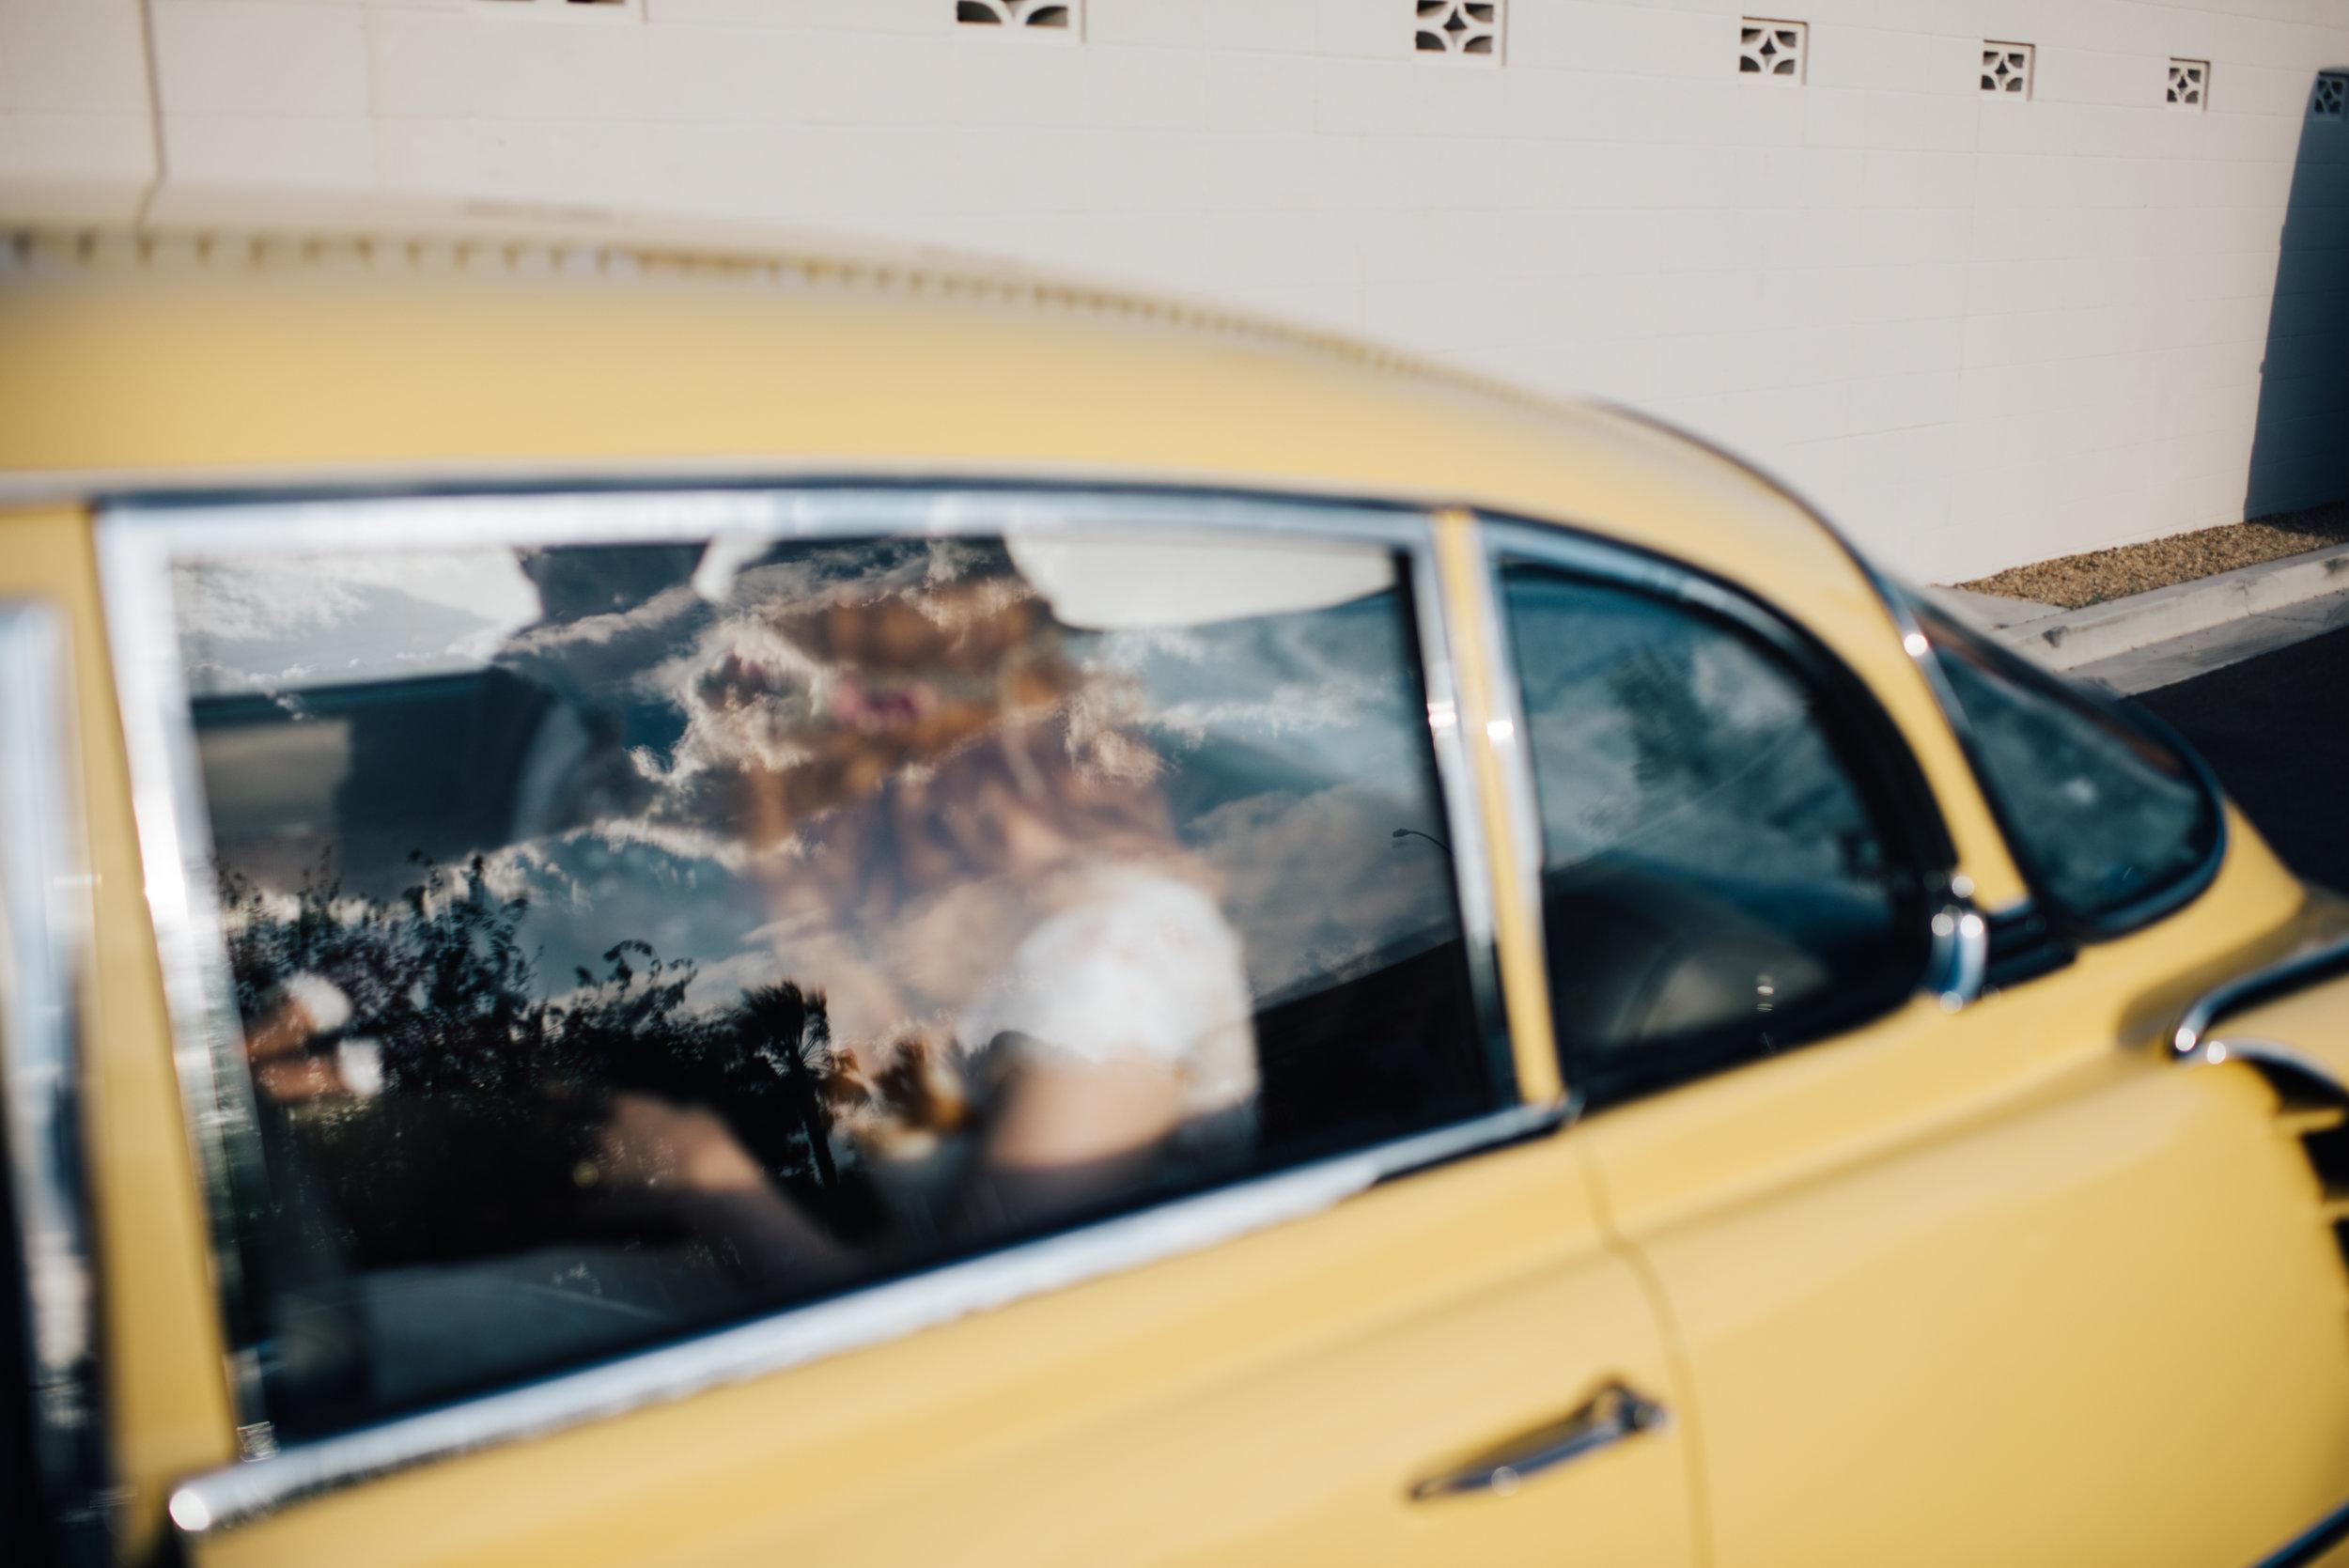 Neon museum Las vegas, Neon Signs,red head, ginger bride, vintage wedding, wedding las vegas, elopement las vegas, elopement, peachy keen union, red head bride, vintage bride, vintage car, tetra, yellow, desert wedding, summer wedding, las vegas, mojave desert, wedding inspiration, wed, i do, charming, las vegas elopement, elope, elopement photographer